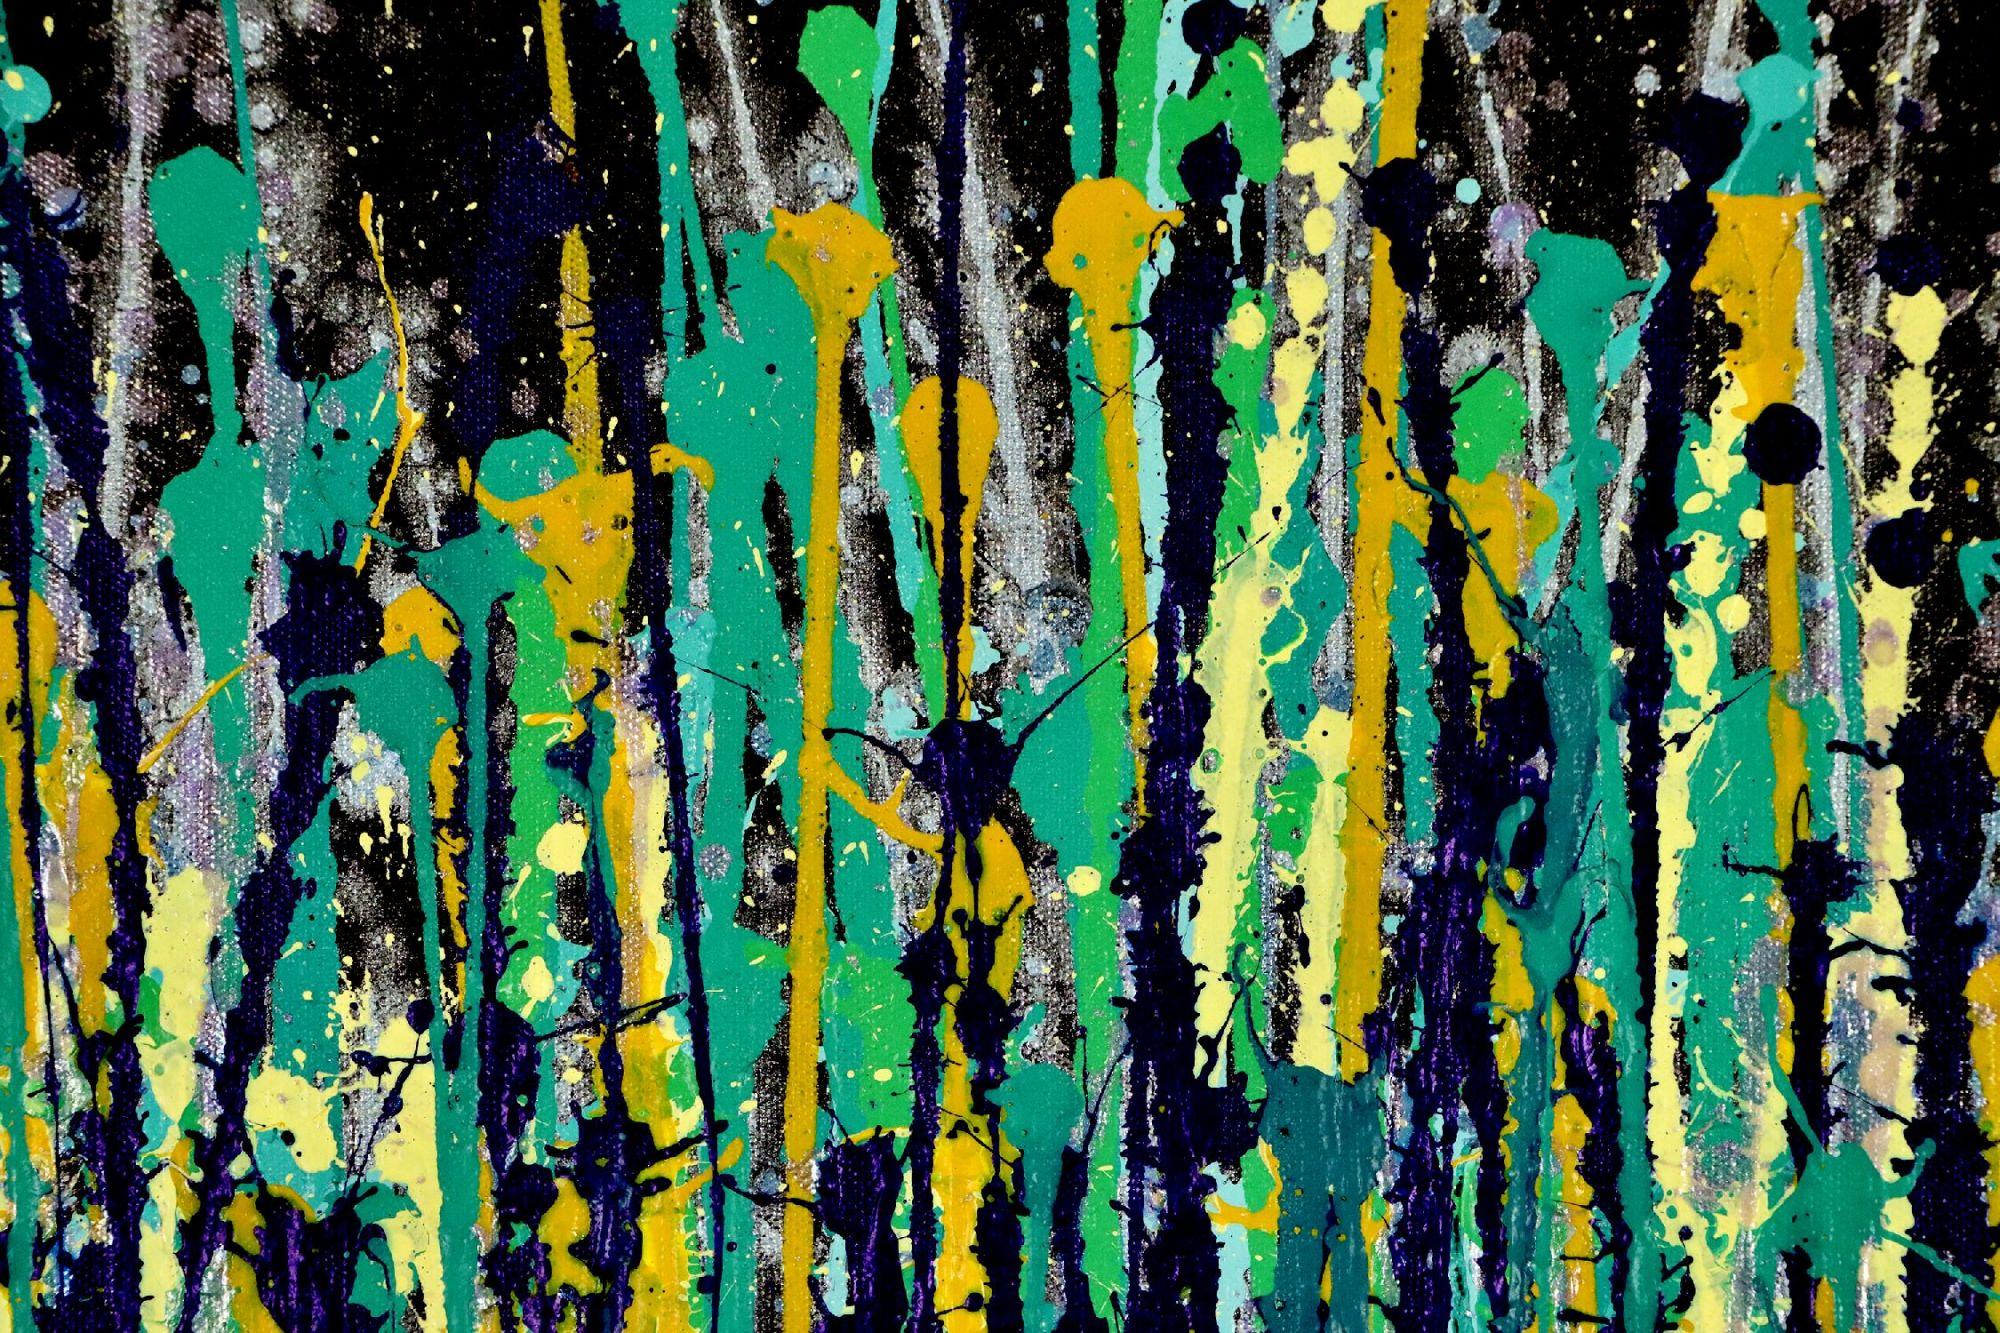 Detail- Shimmer and breeze garden 2 (2020) by Nestor Toro